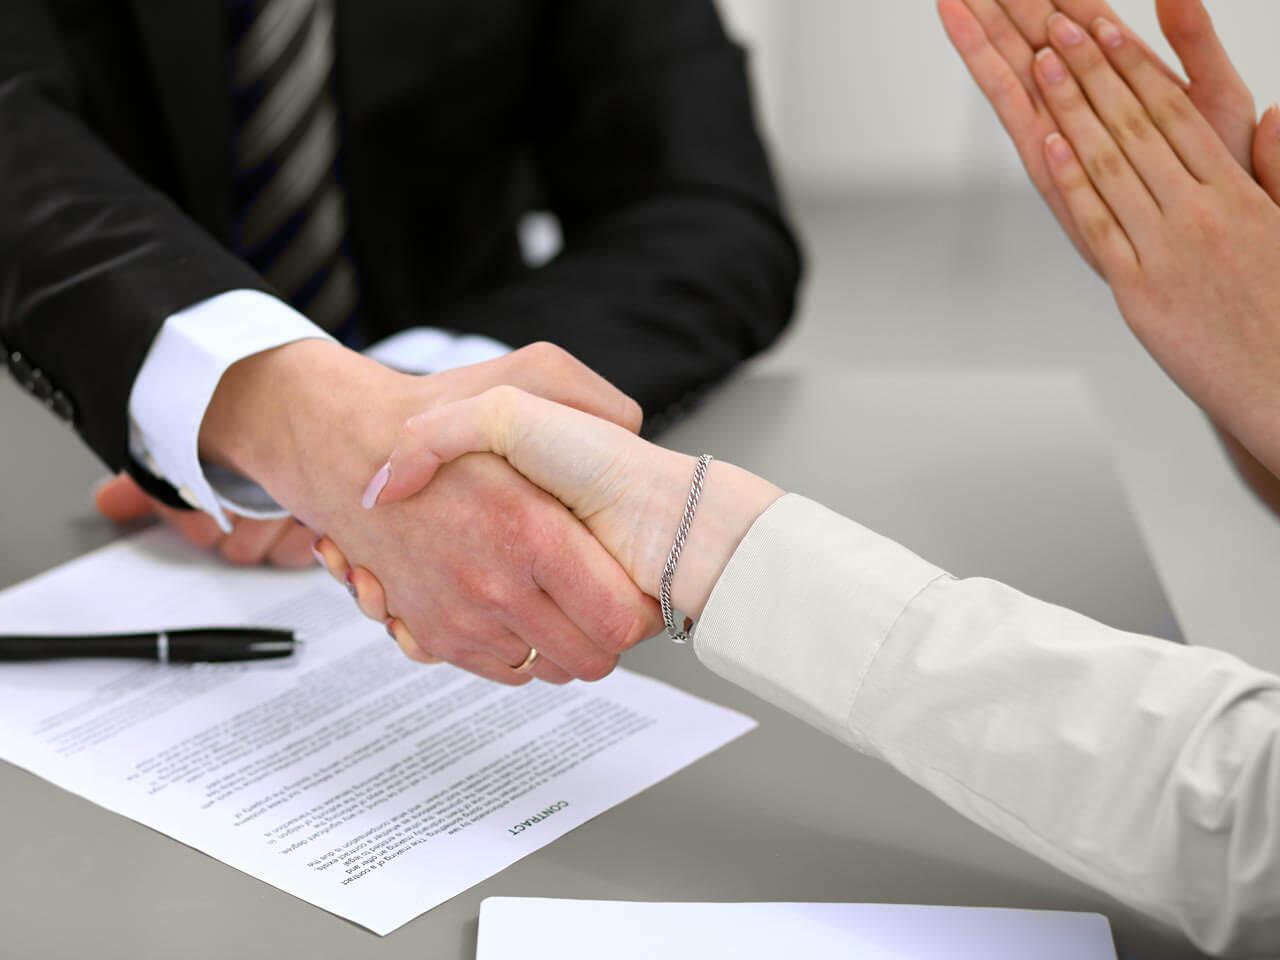 Hand Shaking in Atlanta Estate Law Center